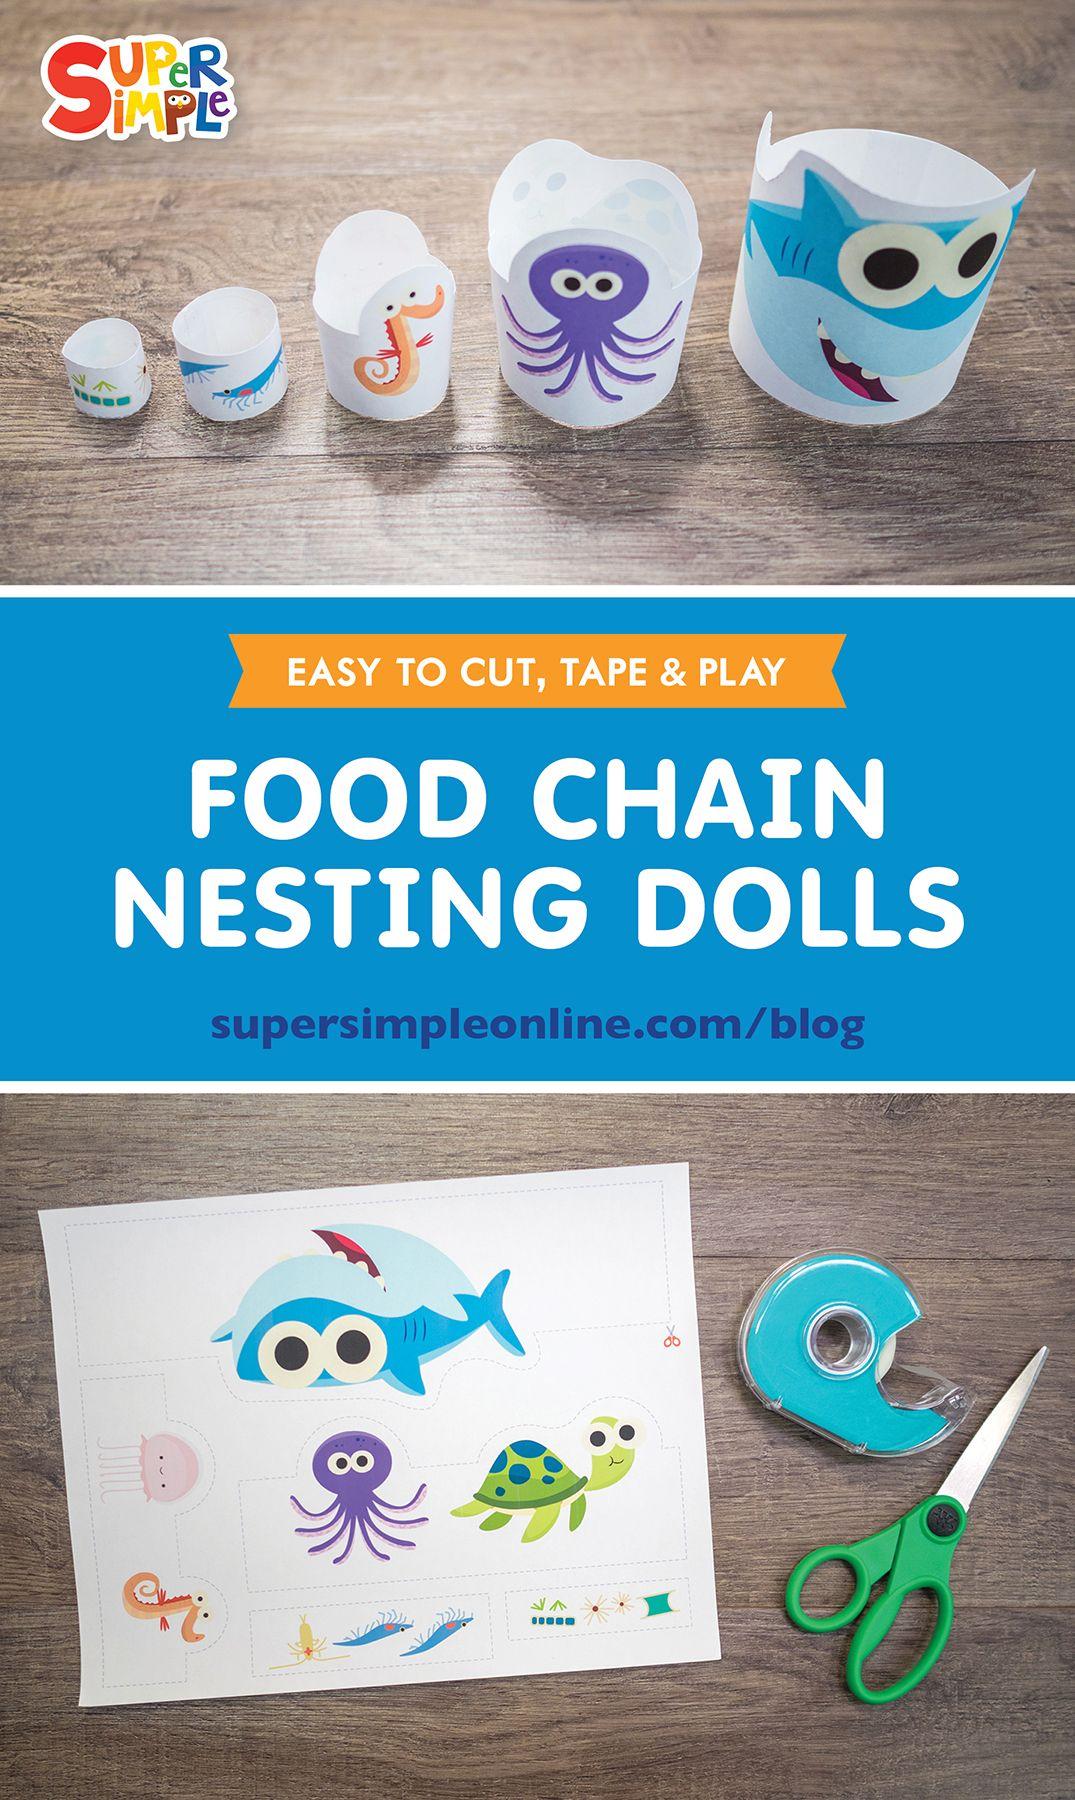 Food Chain Nesting Dolls